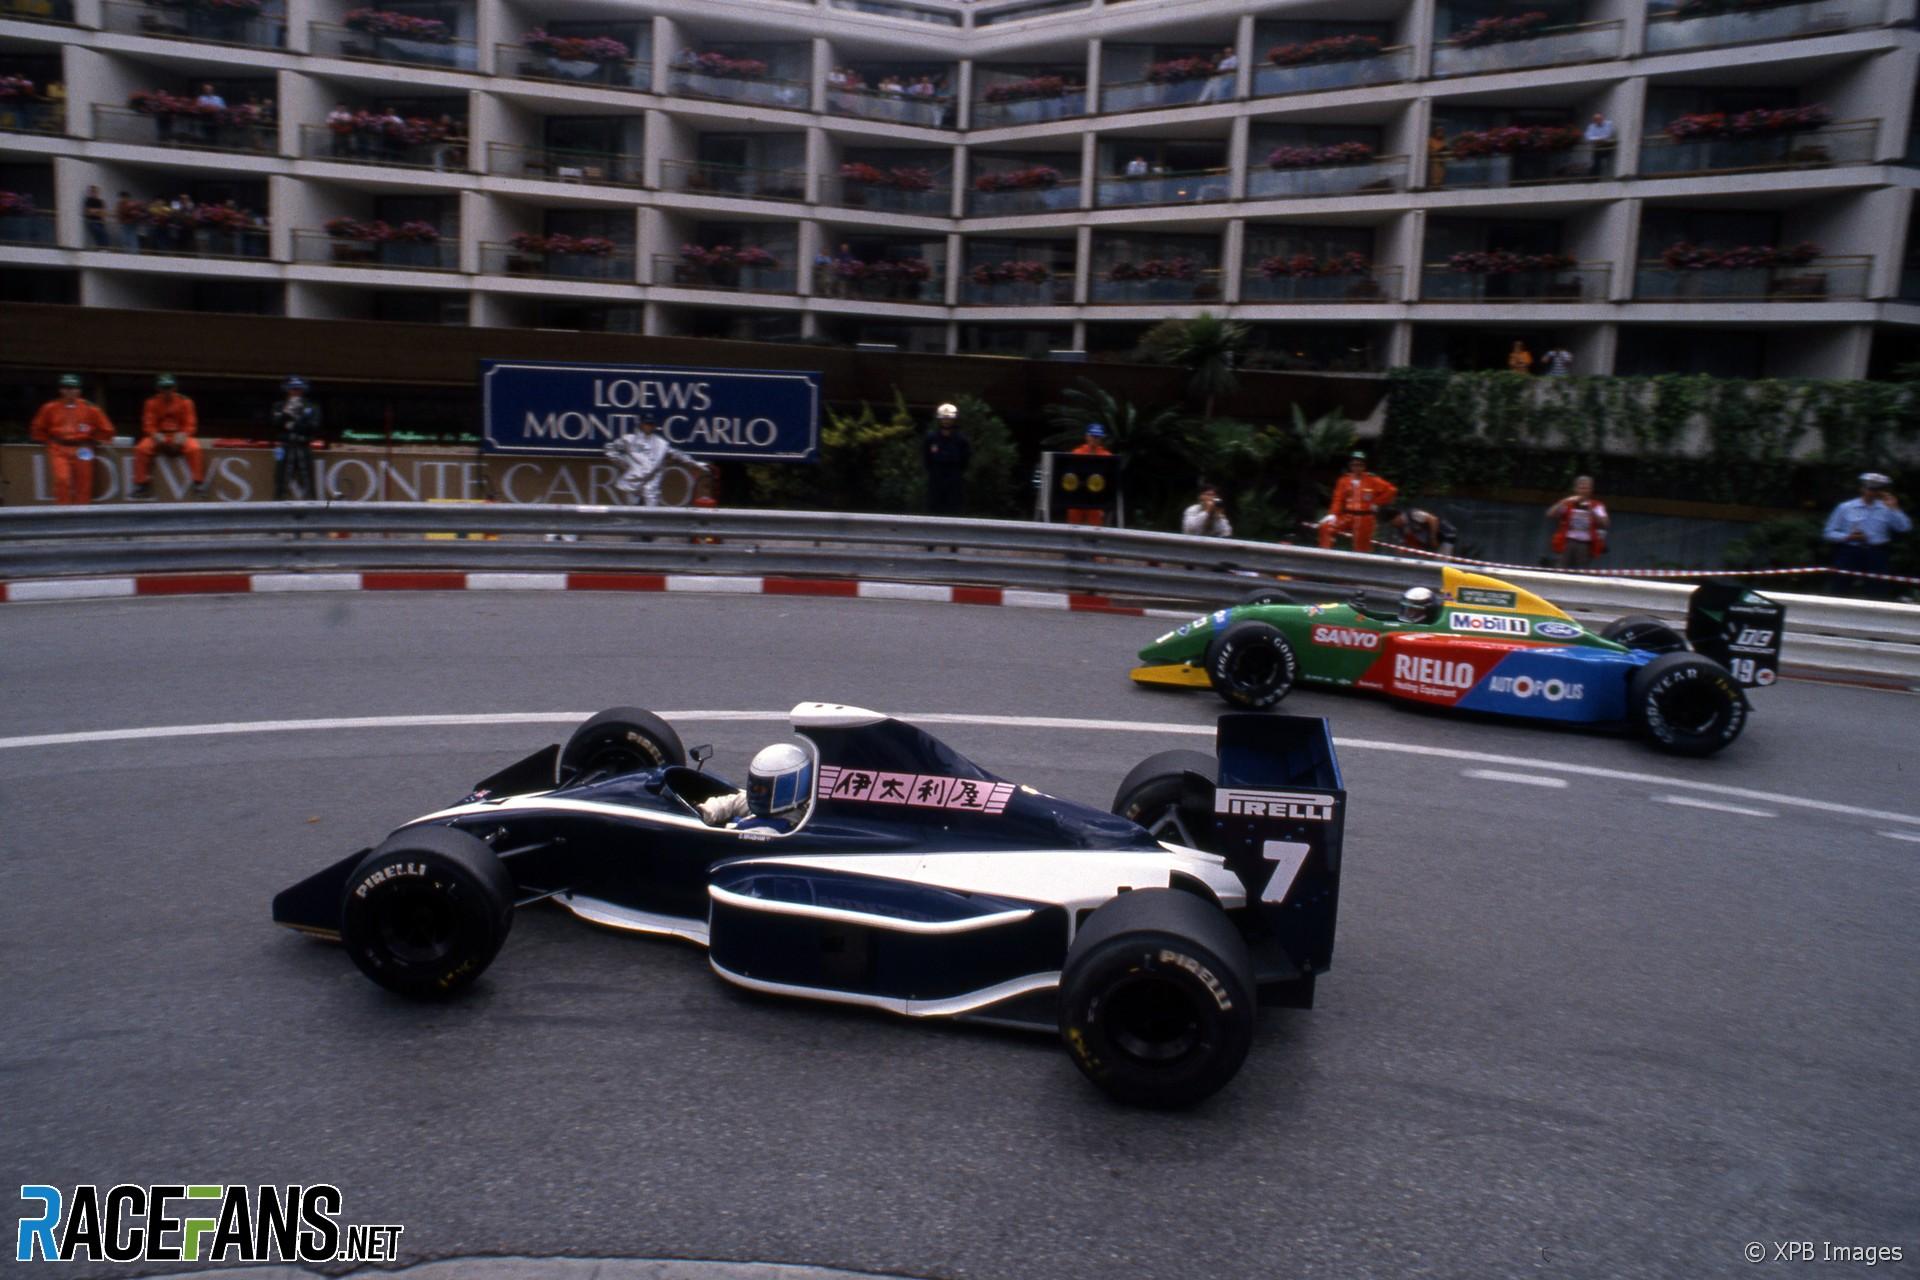 David Brabham, Alessandro Nannini, Monaco, 1990